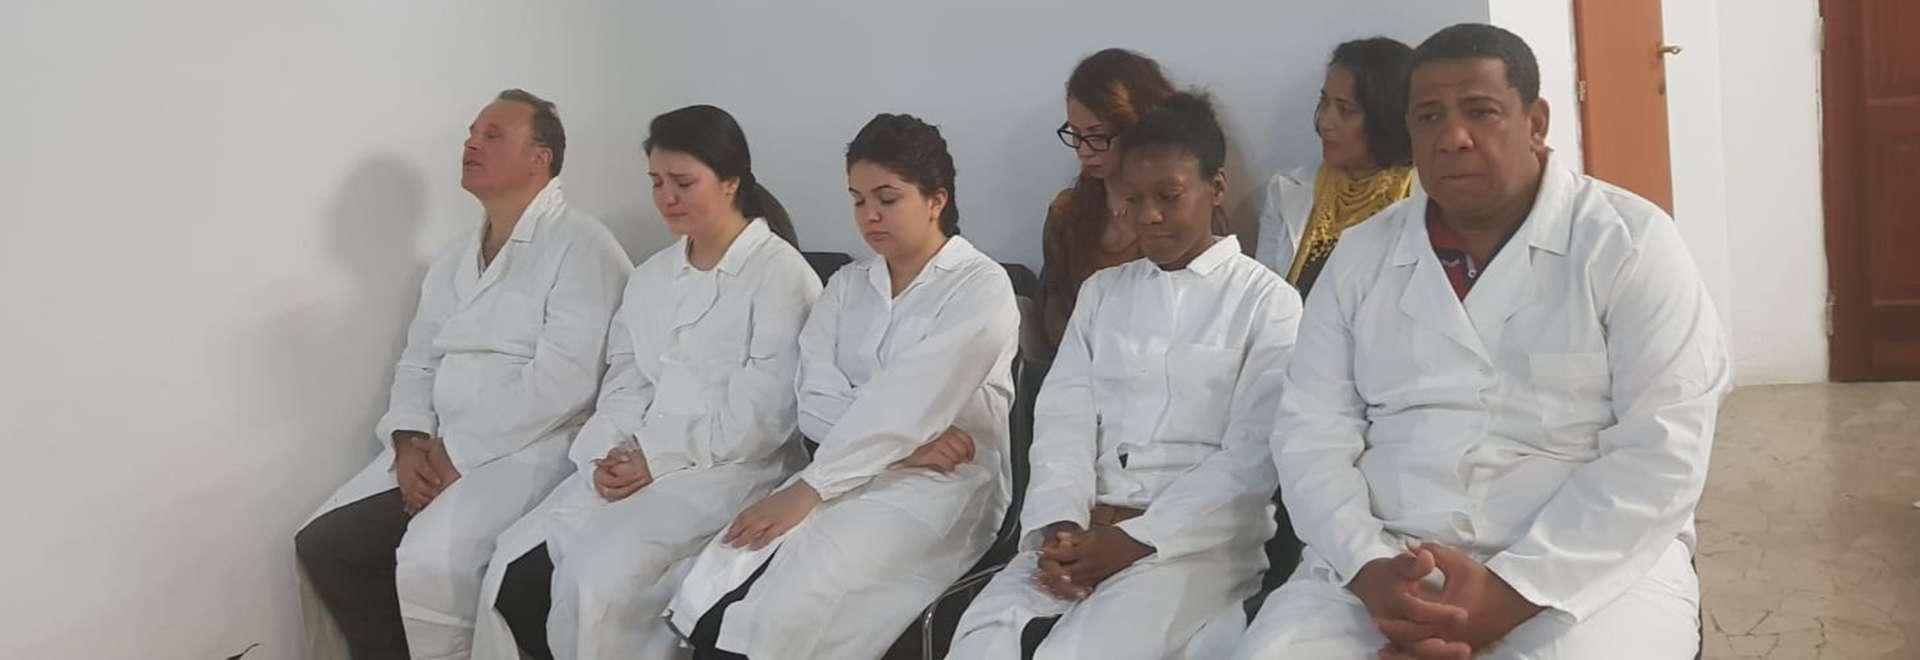 Igreja Cristã Maranata realiza batismo em Roma, Itália